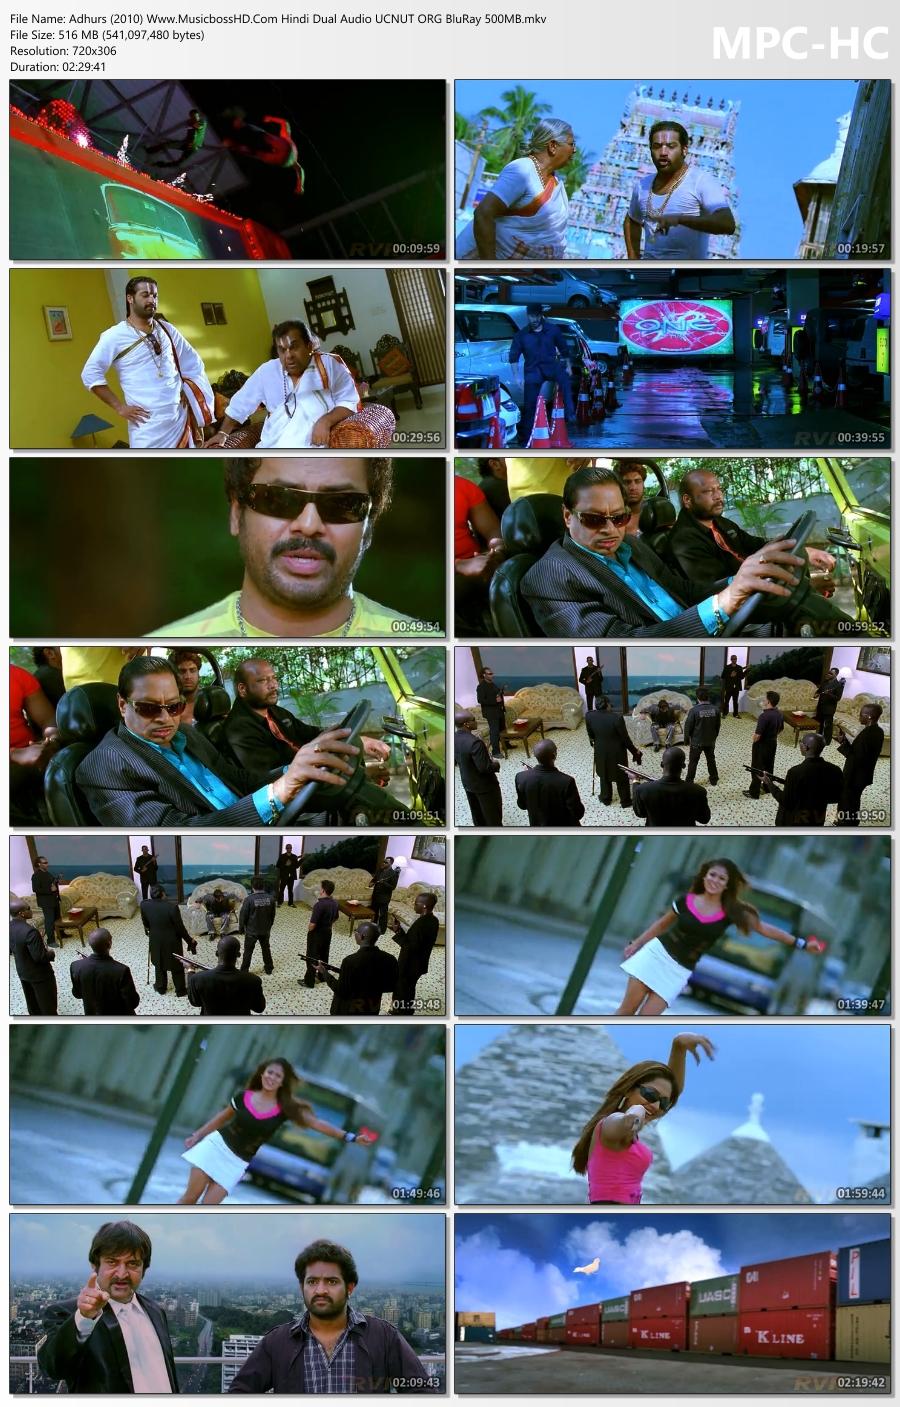 Adhurs-2010-Www-Musicboss-HD-Com-Hindi-Dual-Audio-UCNUT-ORG-Blu-Ray-500-MB-mkv-thumbs